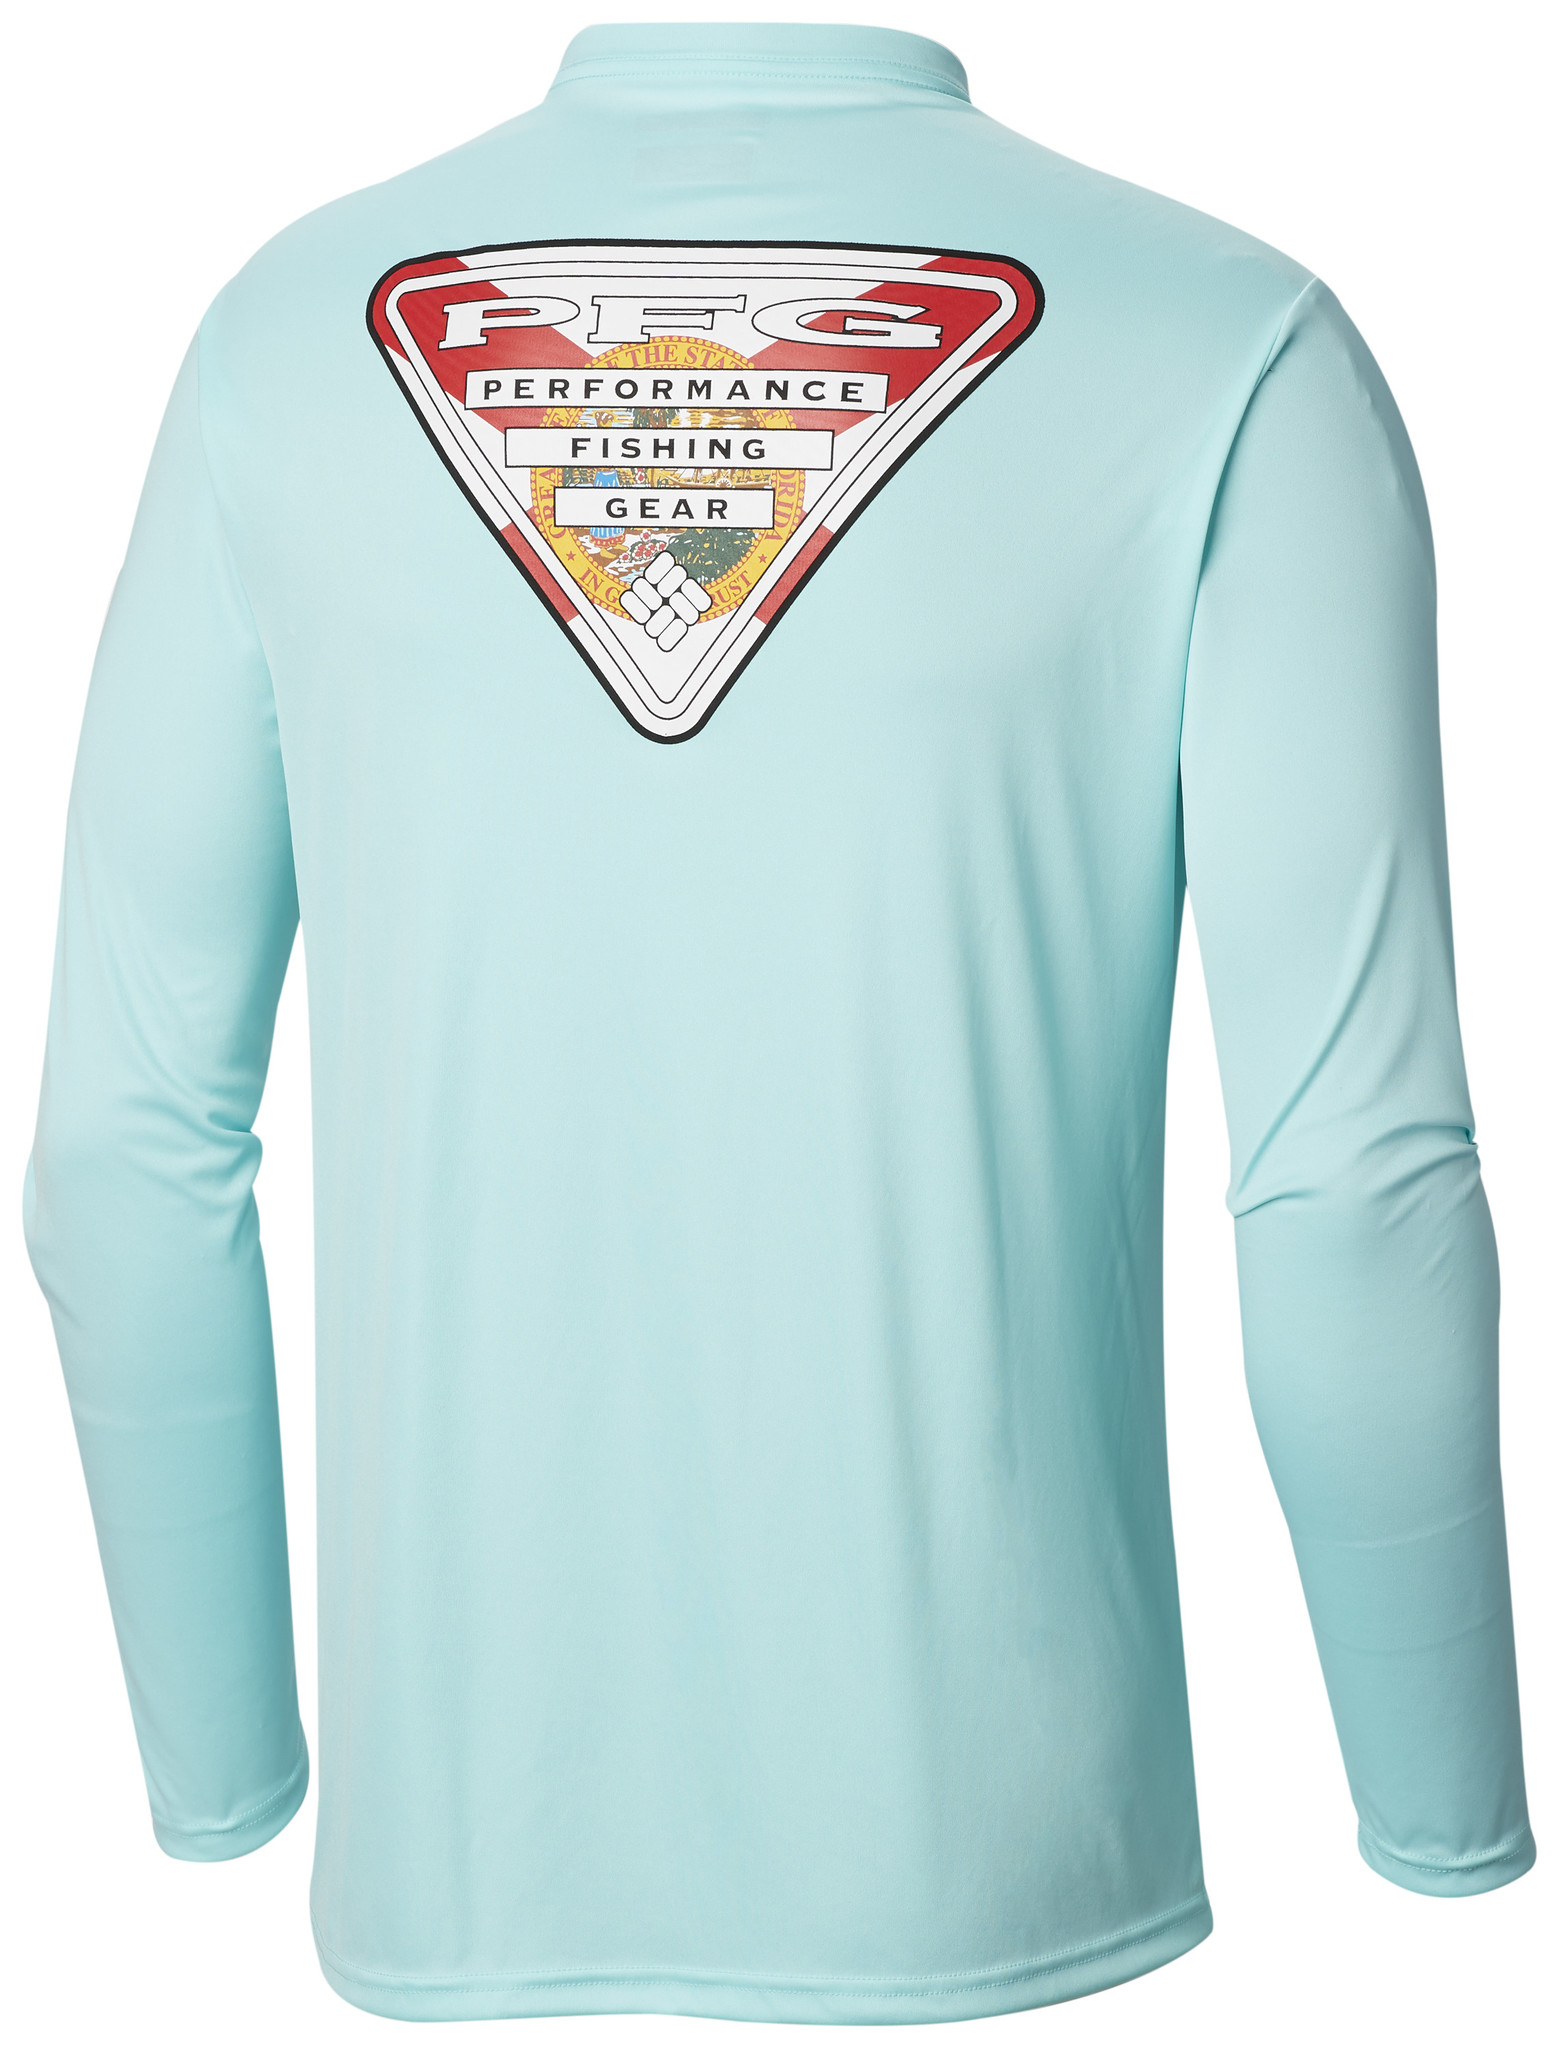 a05bbe4f39d0 Columbia Sportwear Men's Terminal Tackle PFG Triangle Flag™ Long Sleeve  Shirt ...